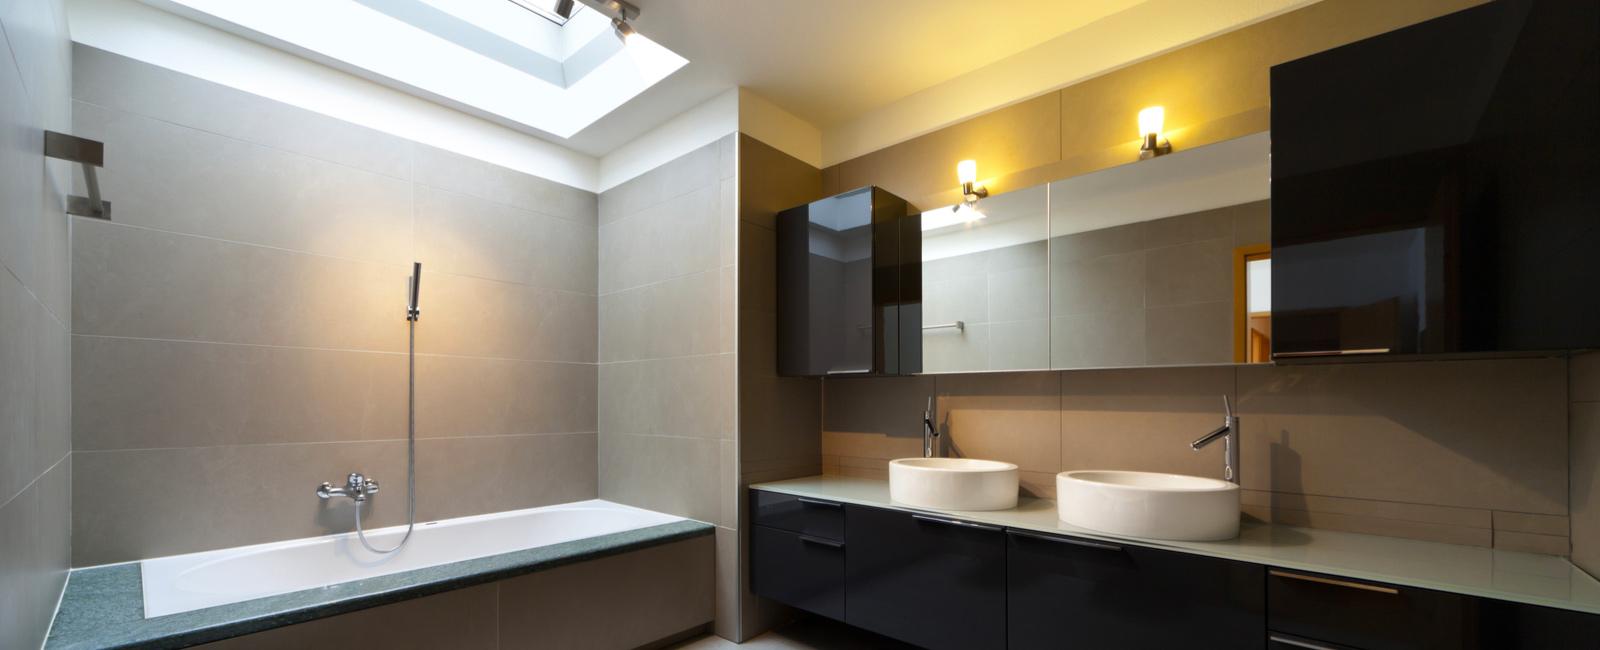 pose luminaire salle de bain